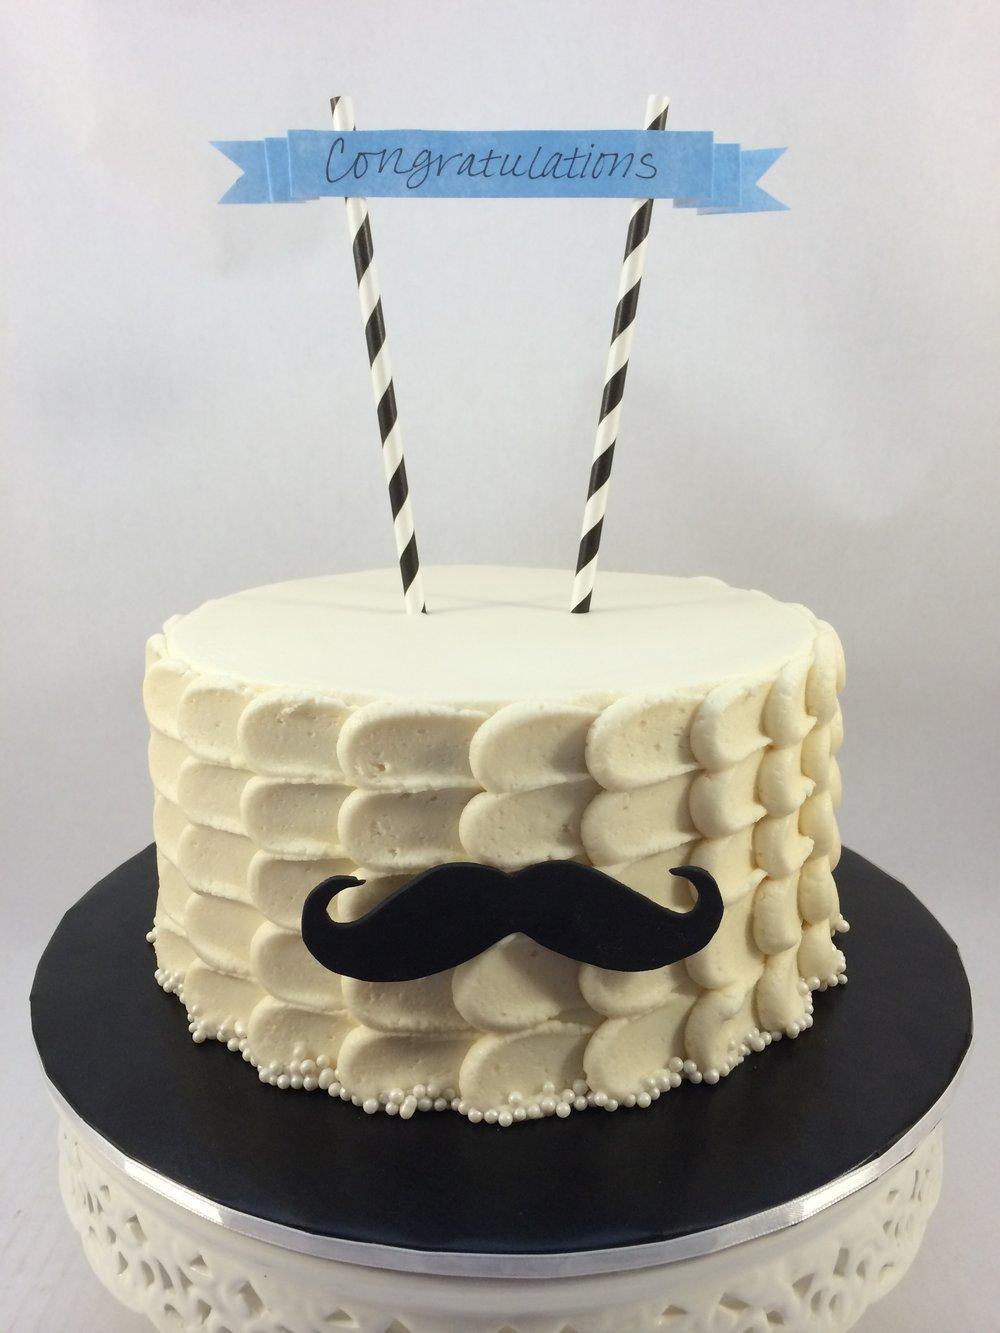 Cake mustache congratulations.JPG